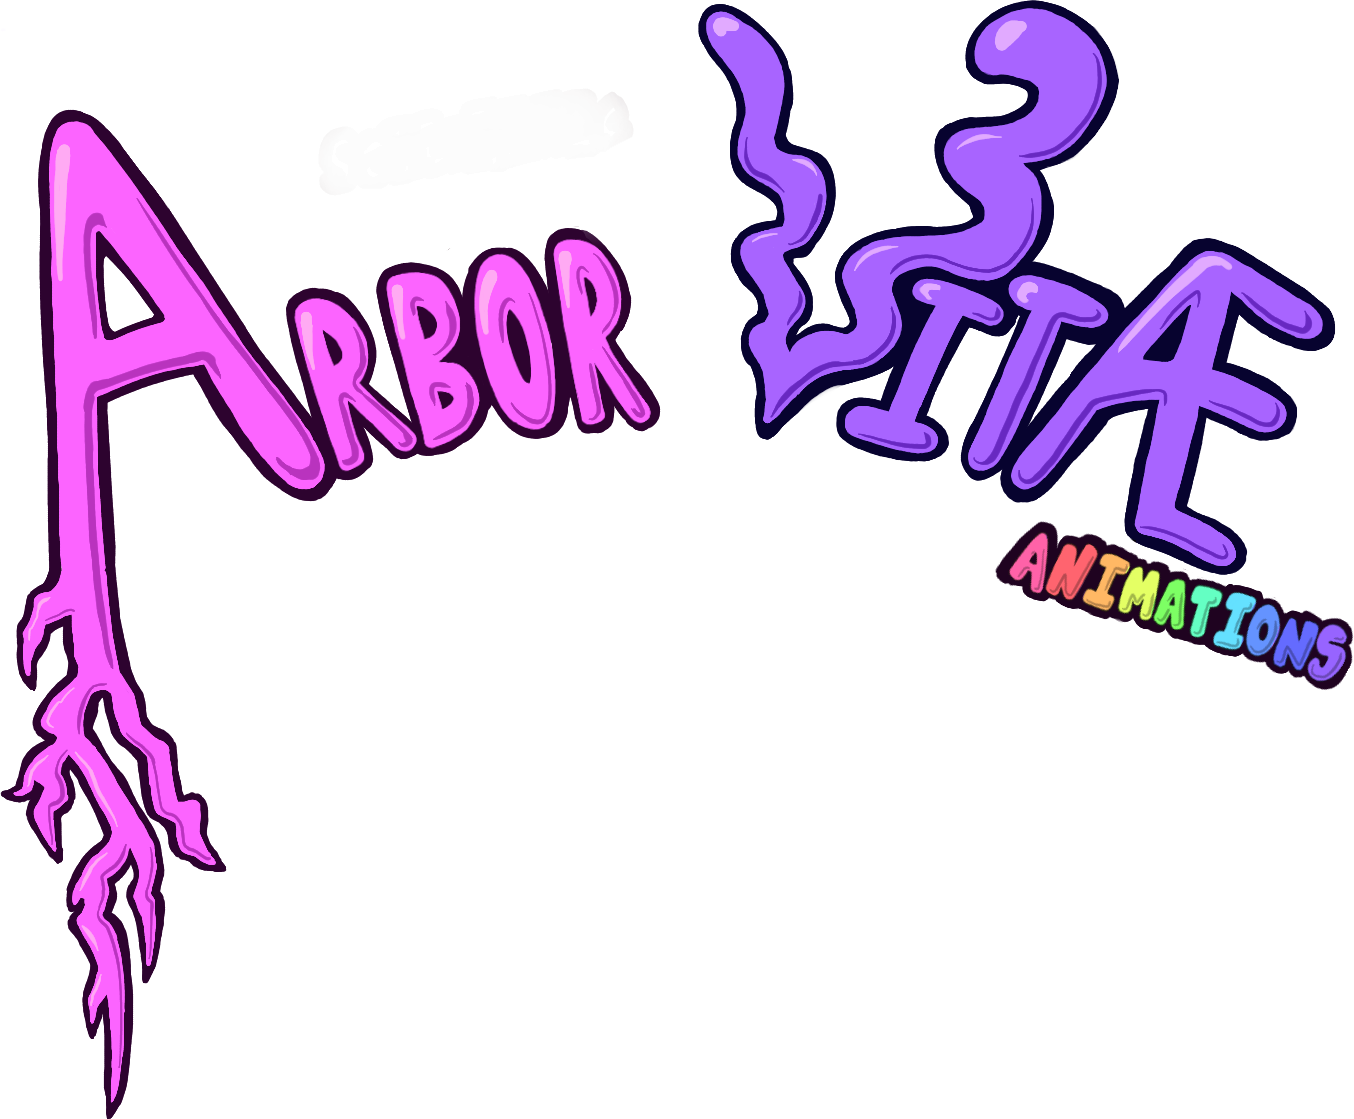 Arbor Vitae Animations